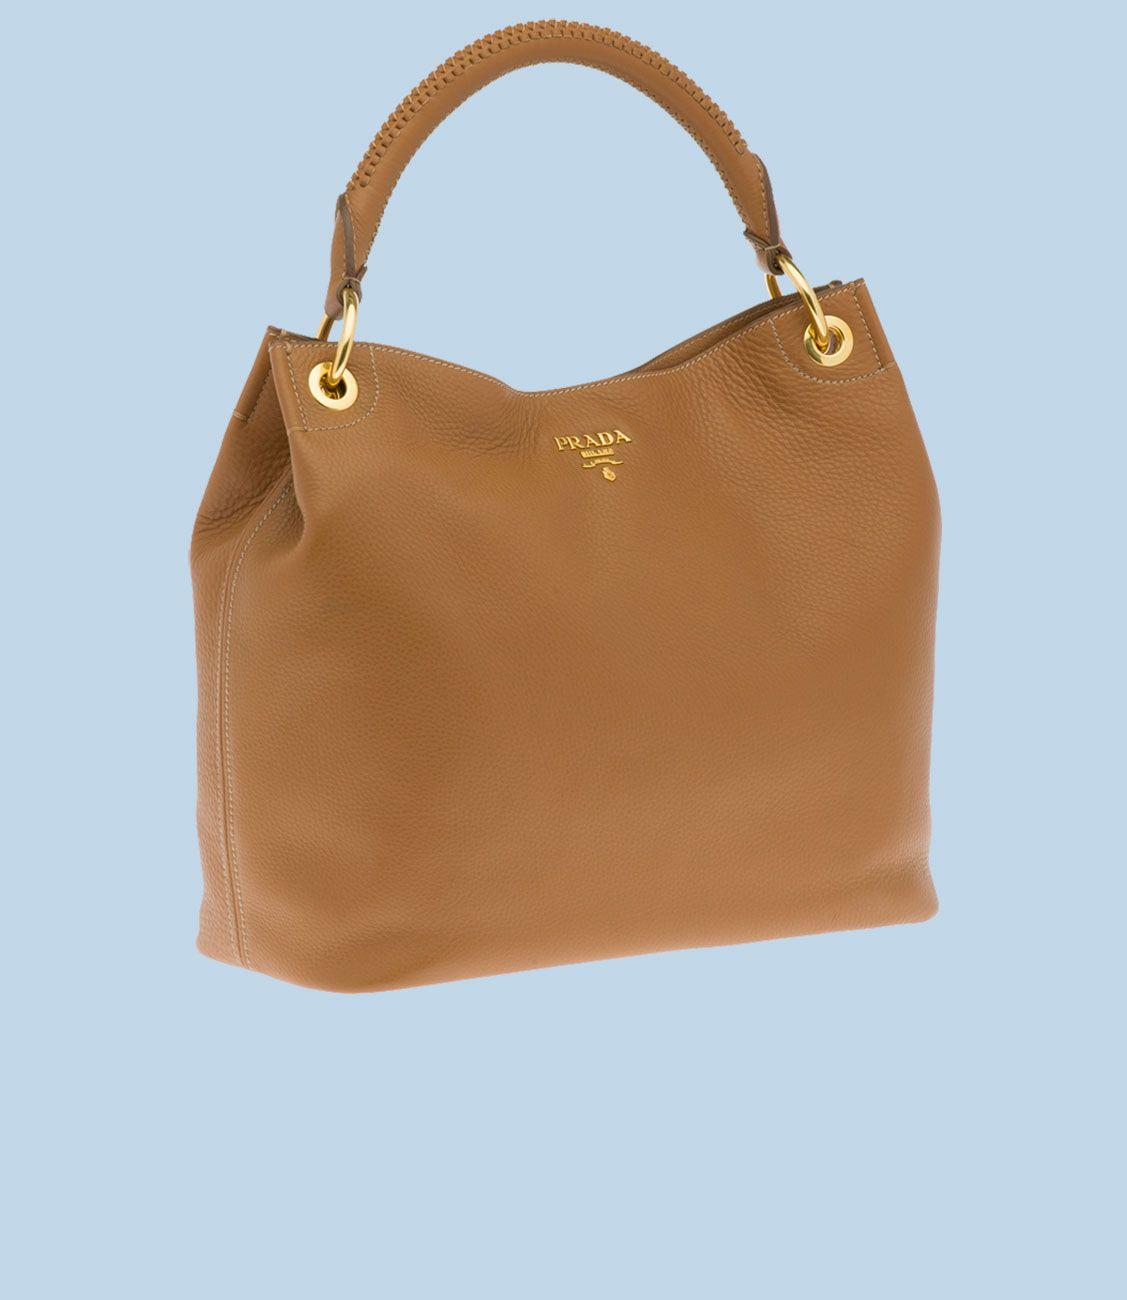 Prada Handbag Sale